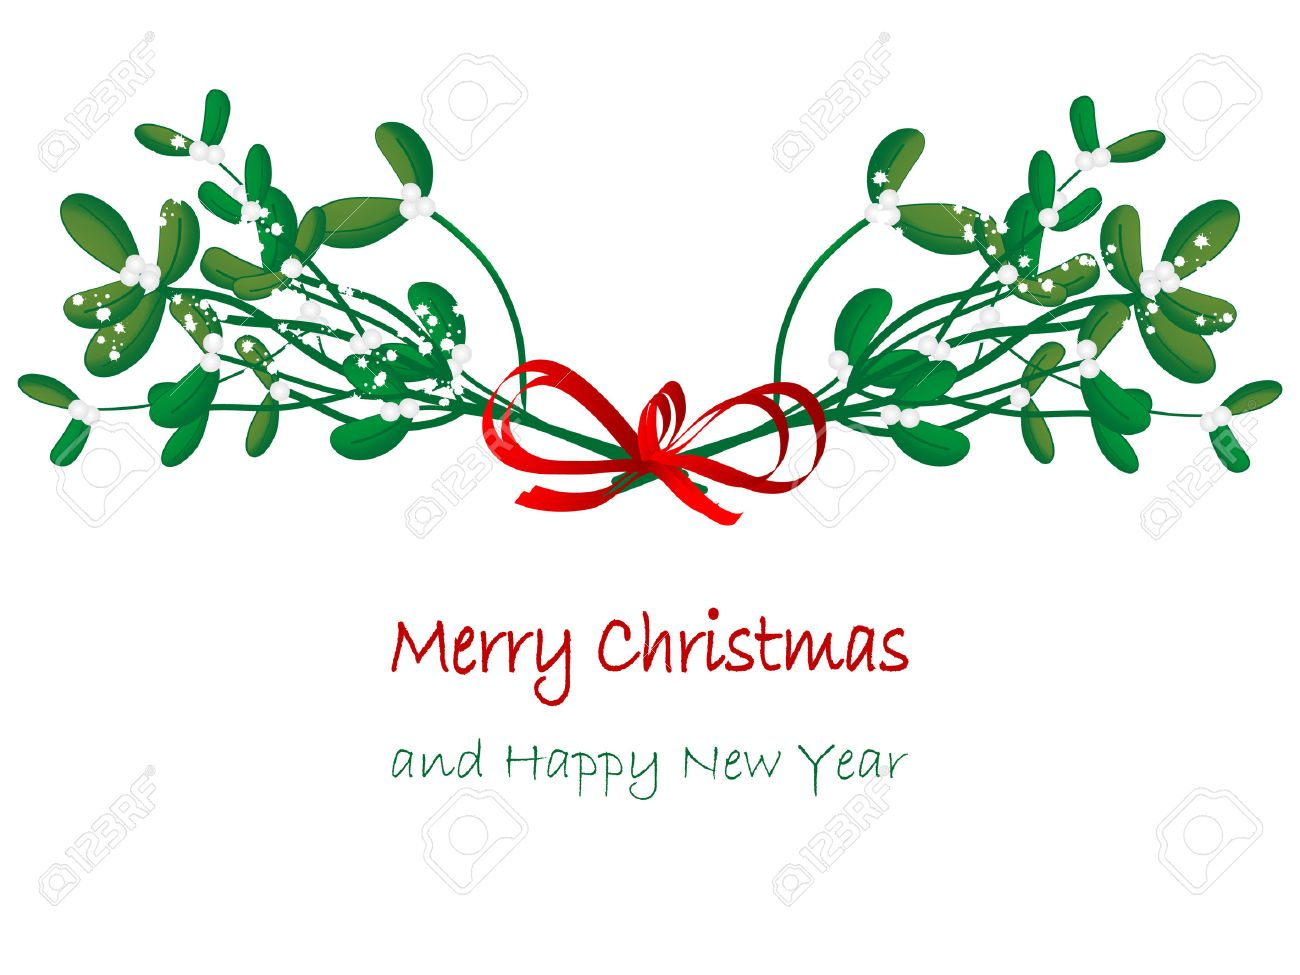 Christmas Green Mistletoe - Vector Illustration Royalty Free ...